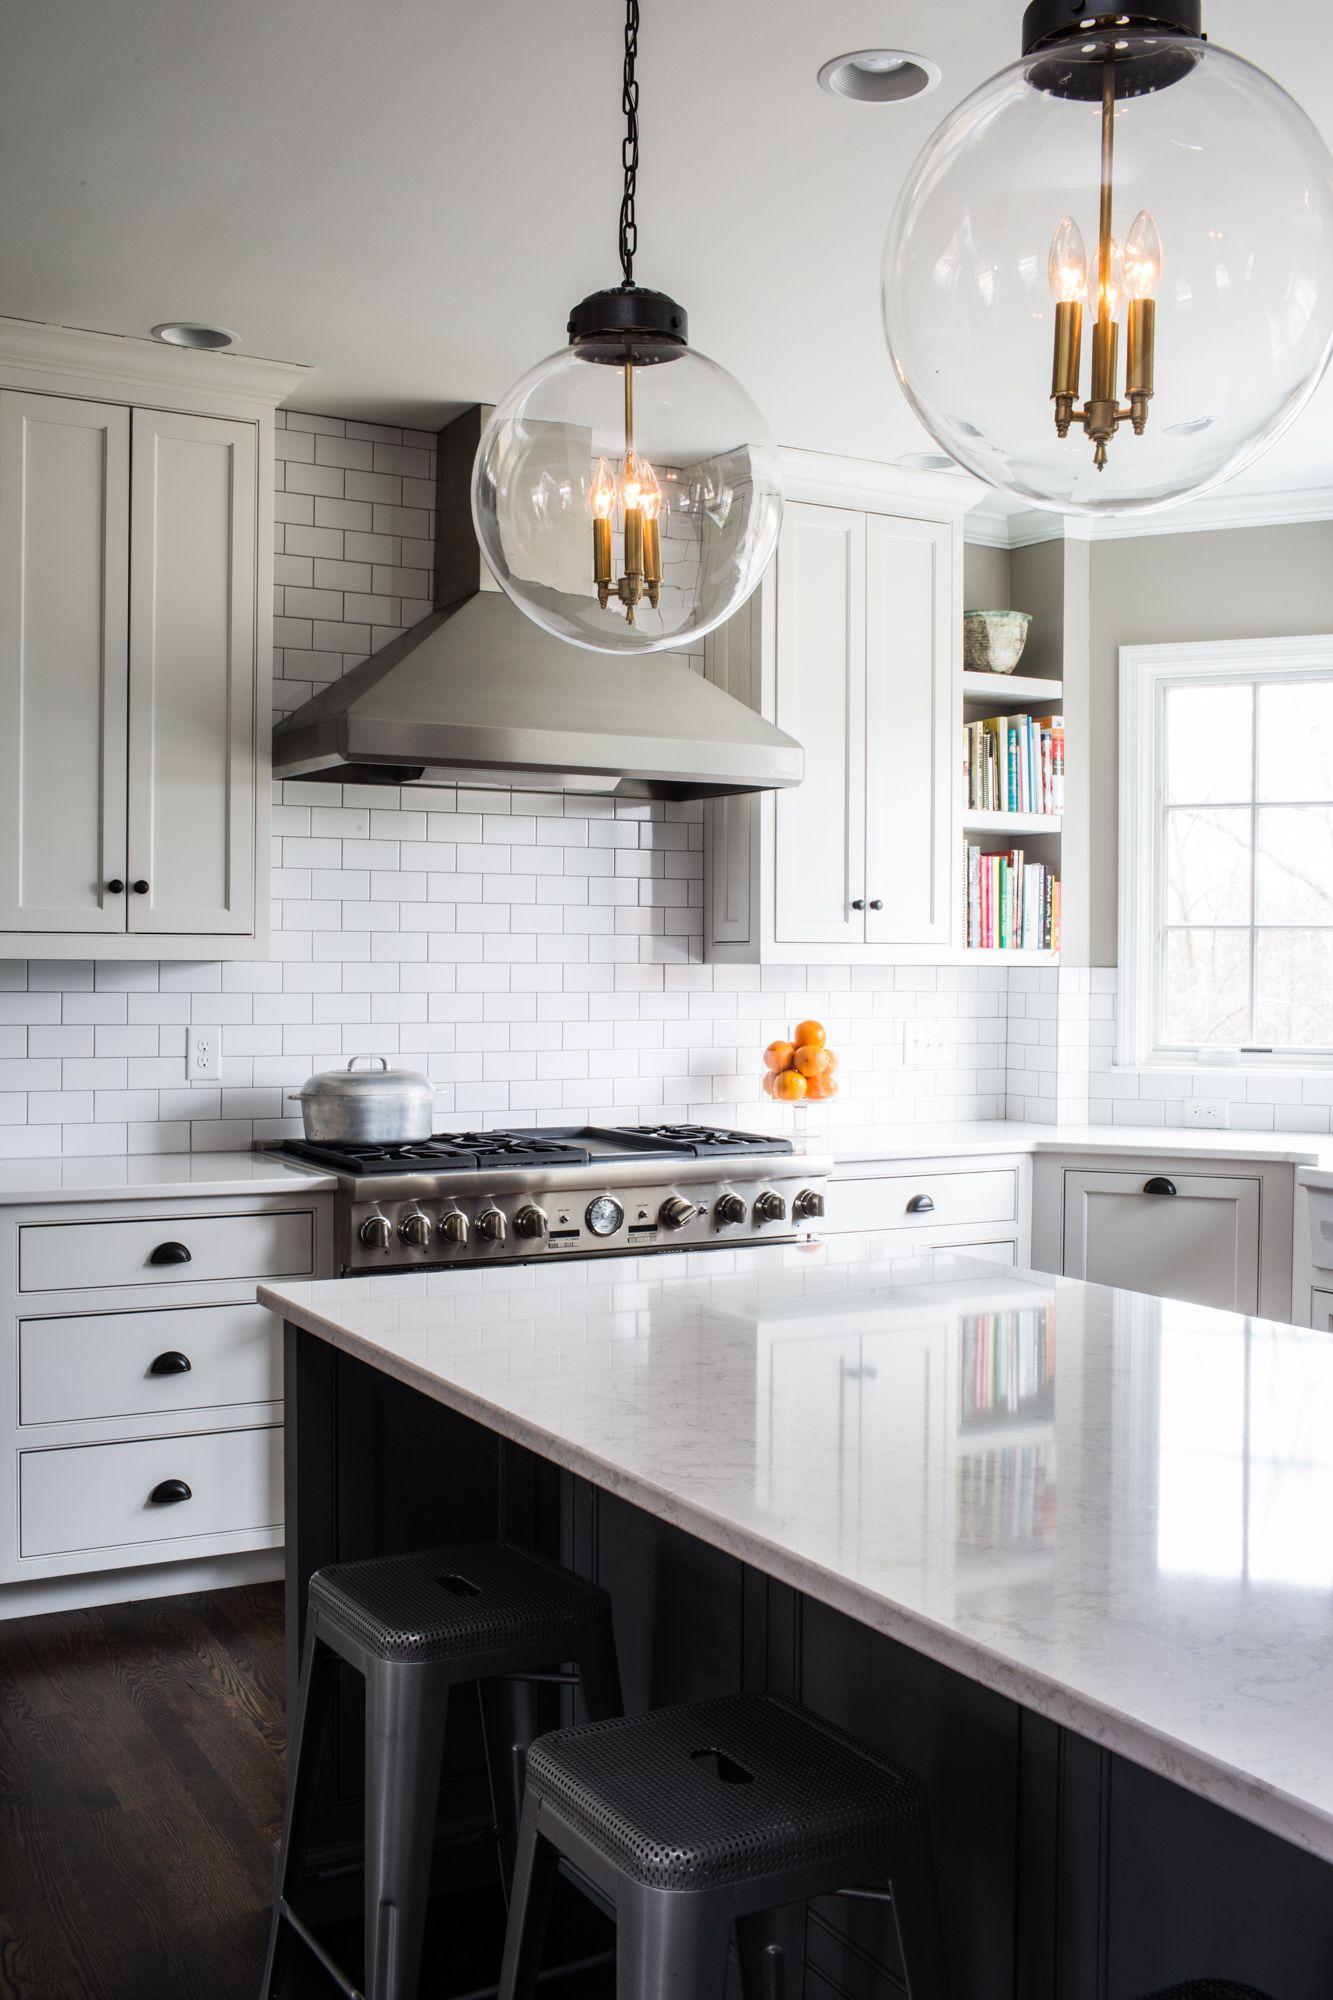 farmhouse kitchen with white countertops white subway tiles and grey cabinets kitchen white on farmhouse kitchen decor countertop id=13290